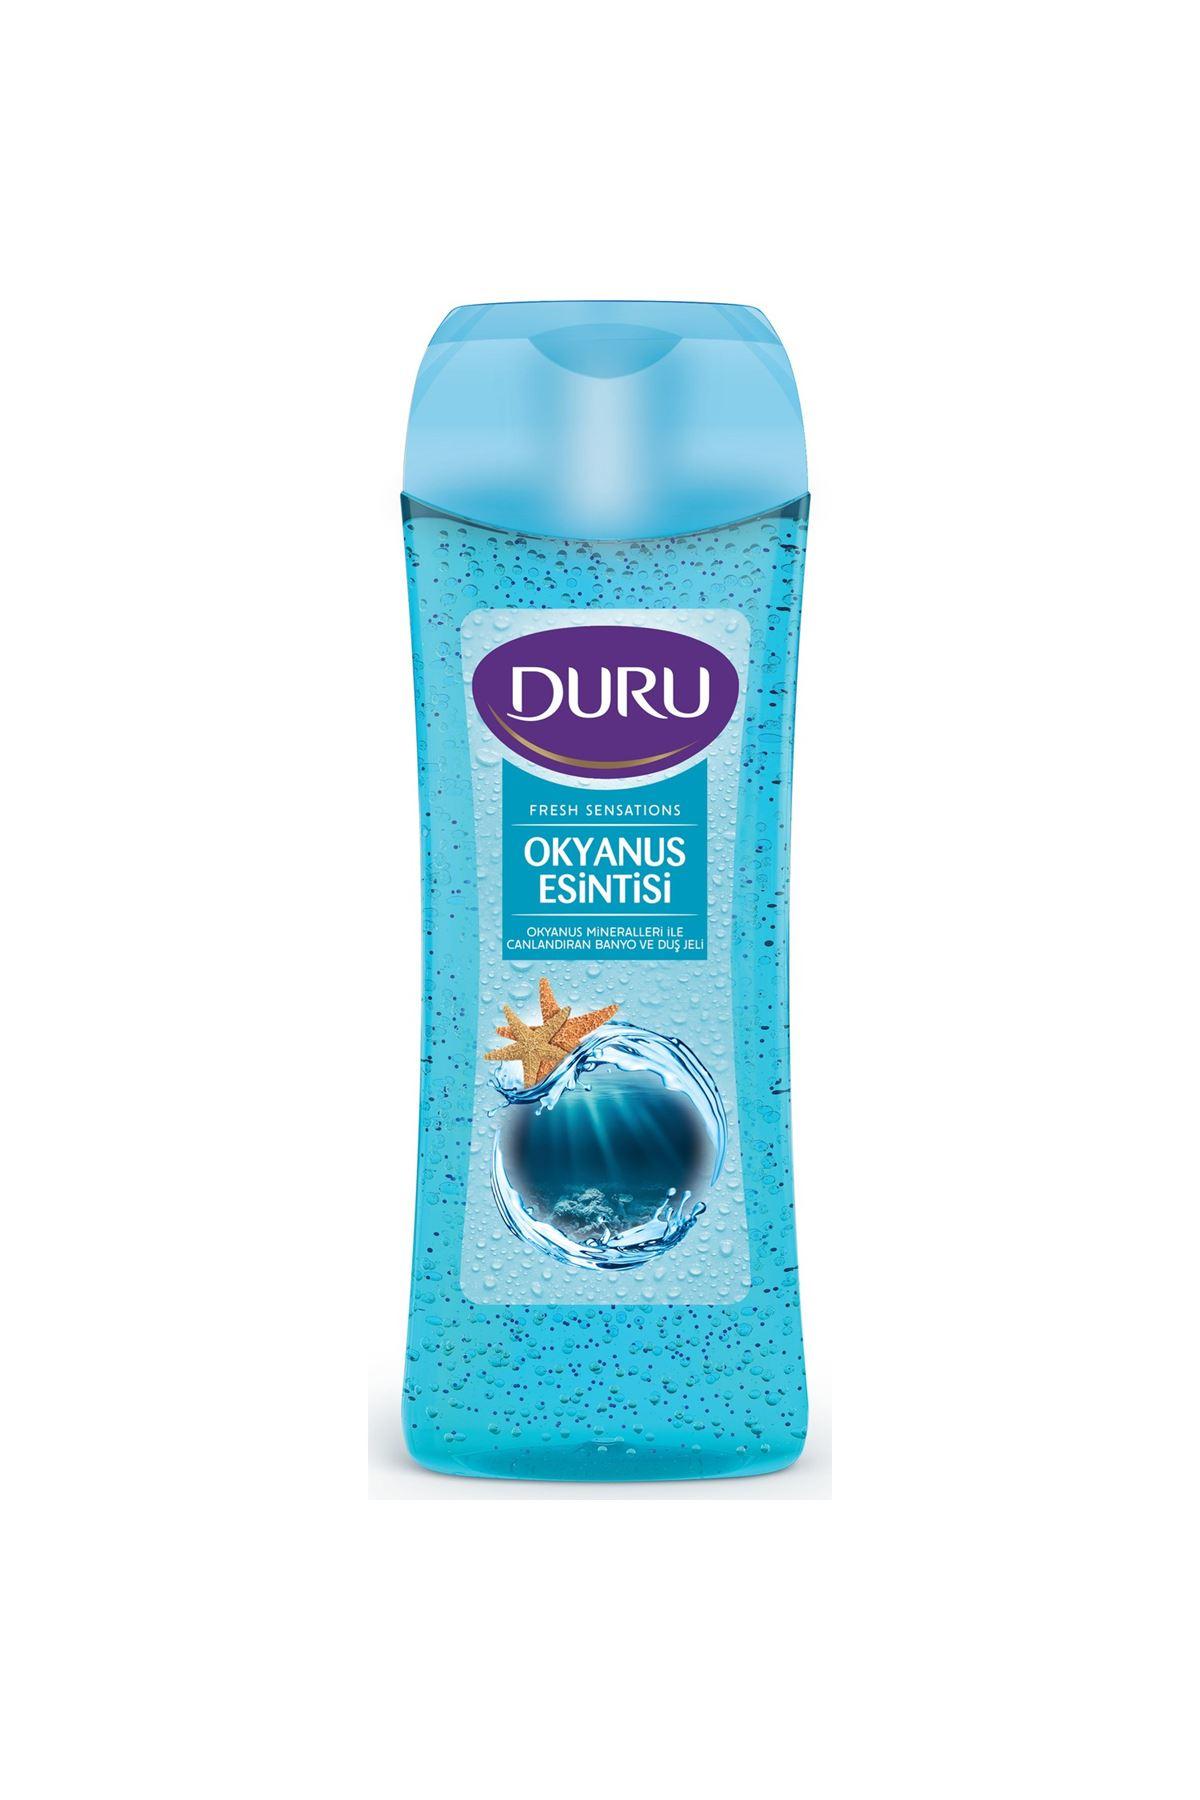 Duru Fresh Sensations Okyanus Esintisi Duş Jeli 250 ml